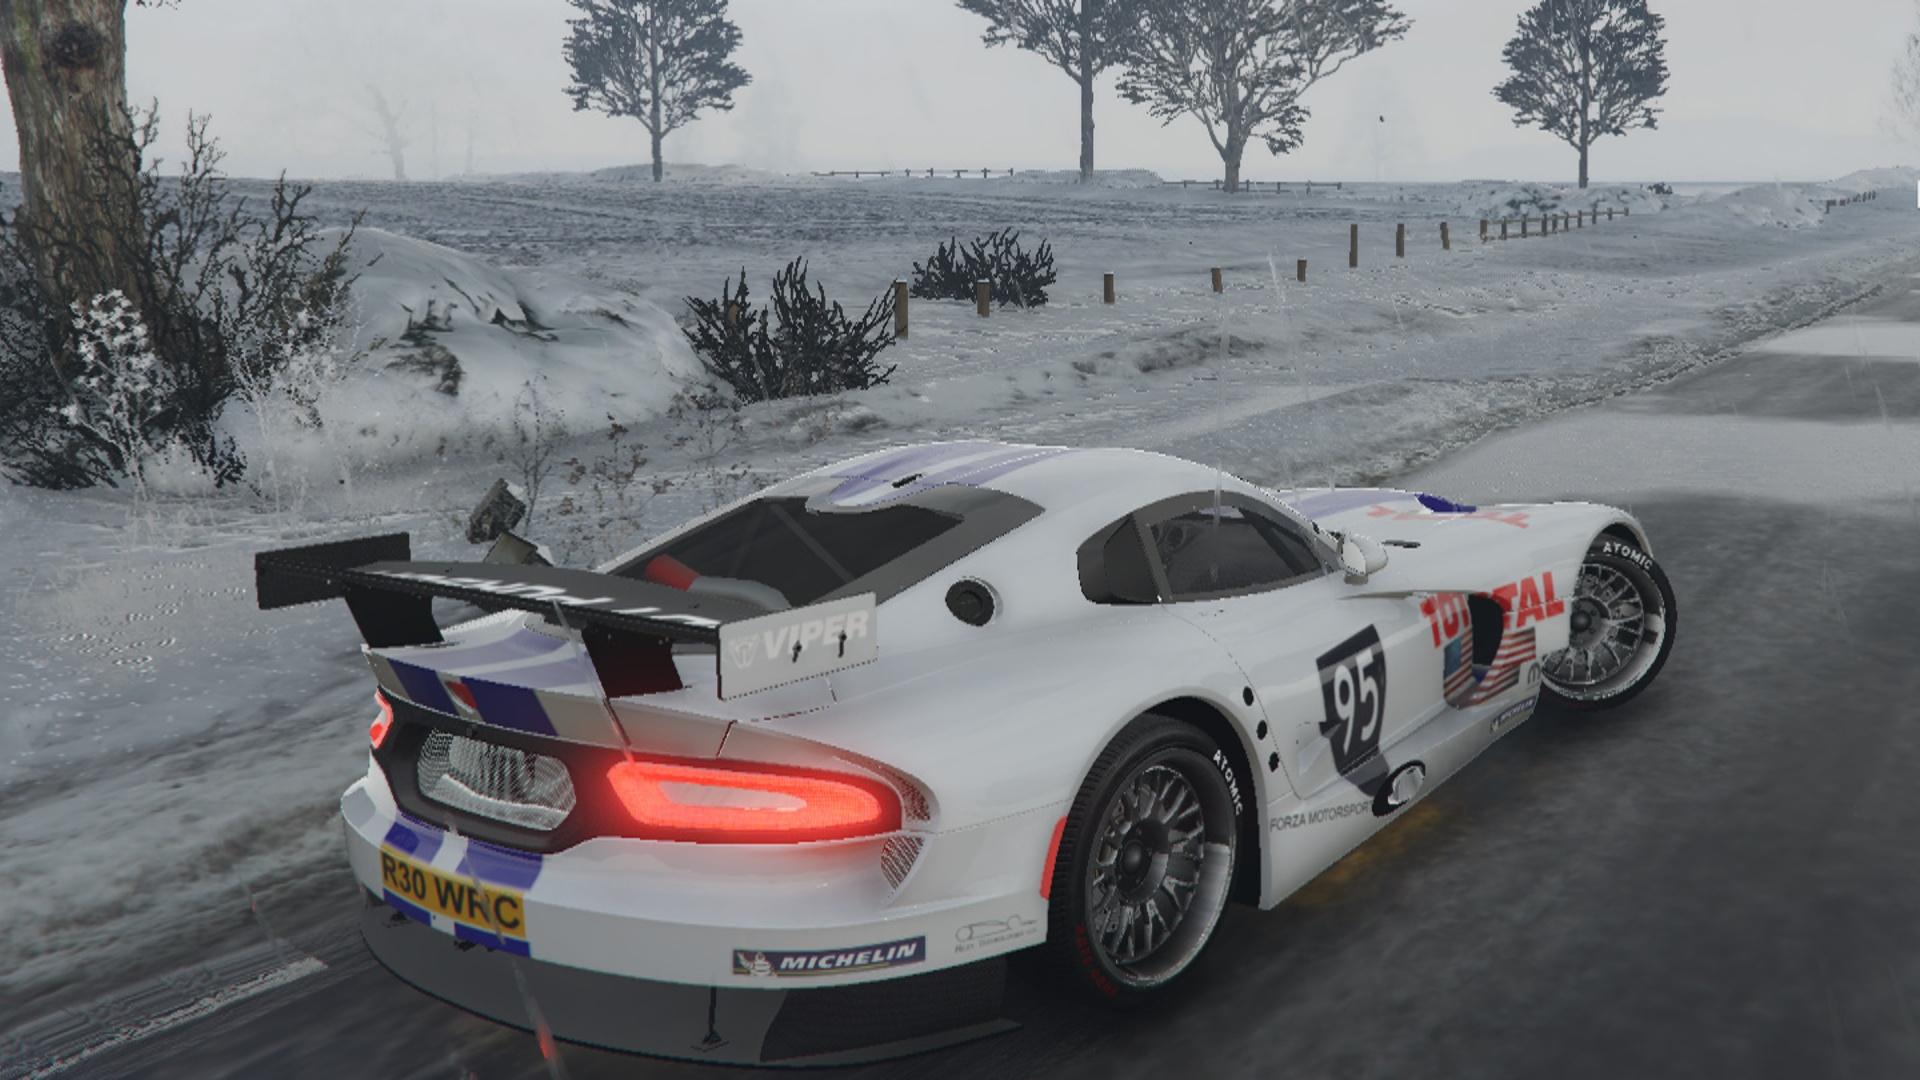 2015 dodge viper gts-r custom livery - gta5-mods